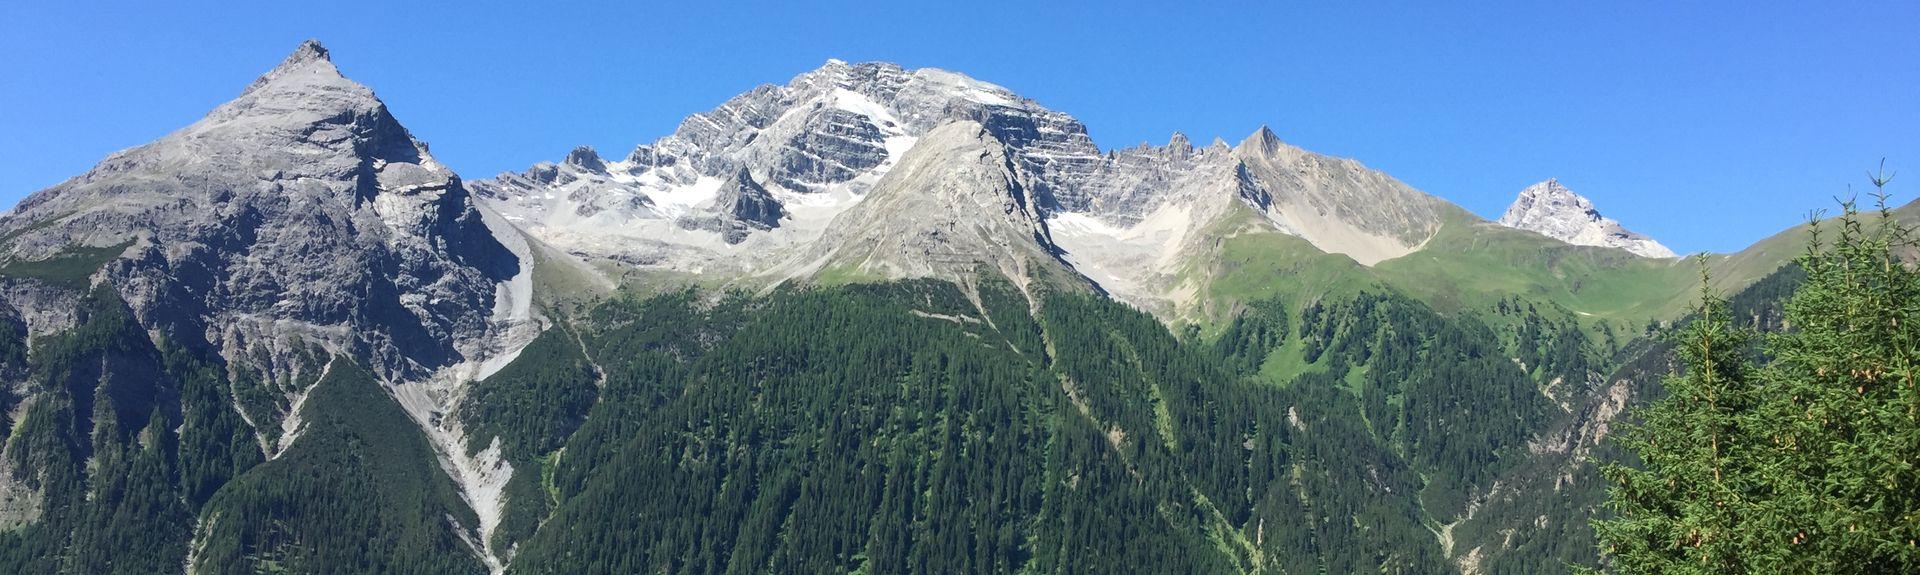 Wiesen, Grisons, Suisse